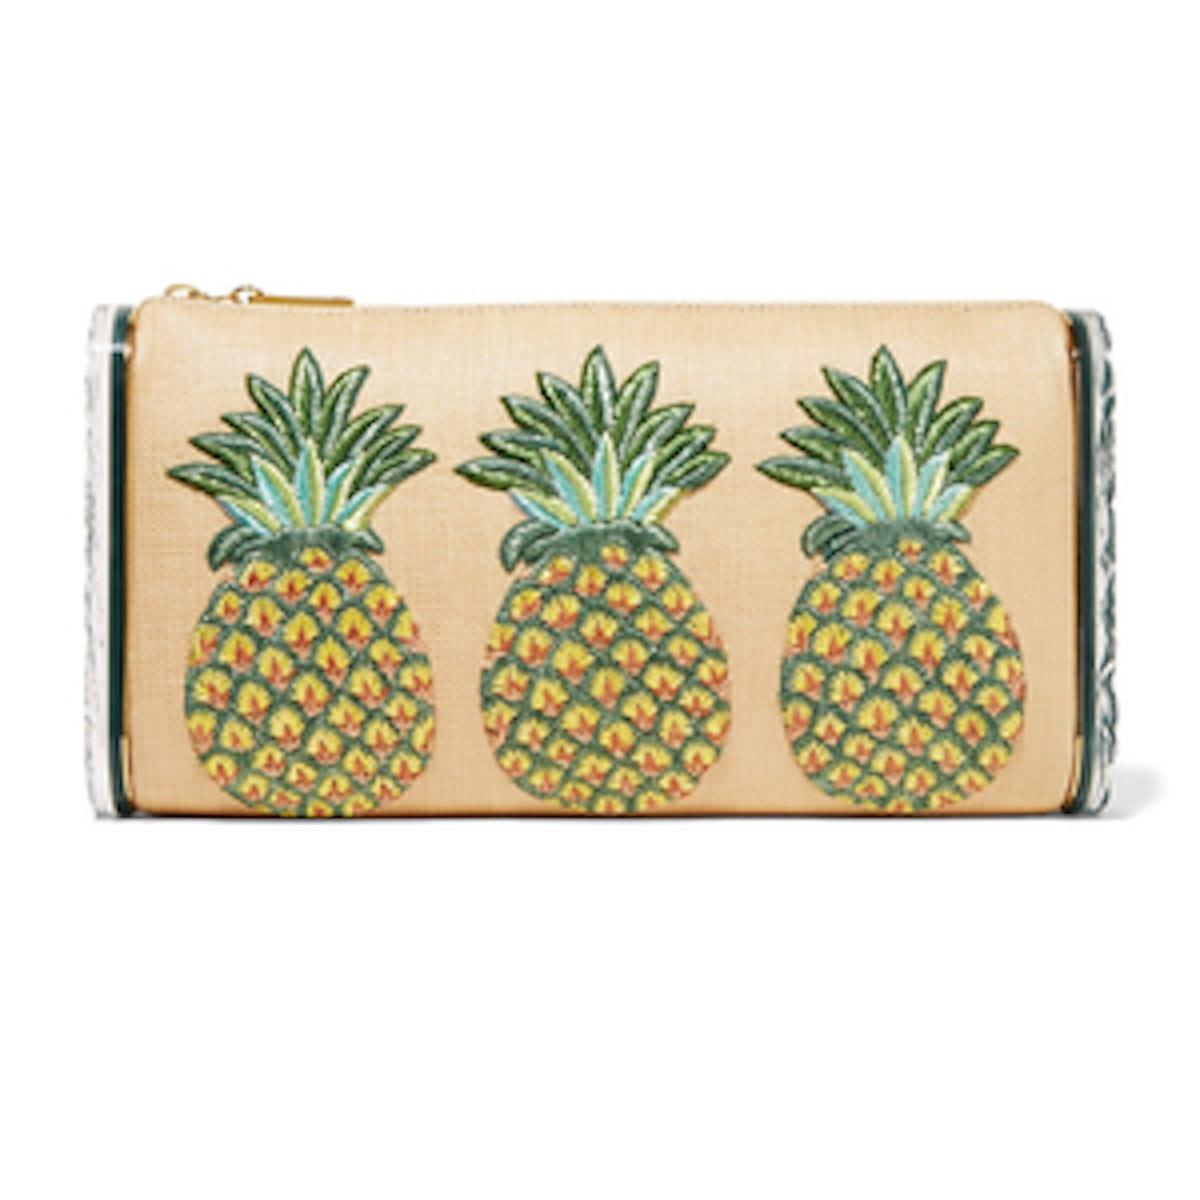 Edie Parker Jumbo Lara Pineapple Embroidered Raffia and Acrylic Box Clutch